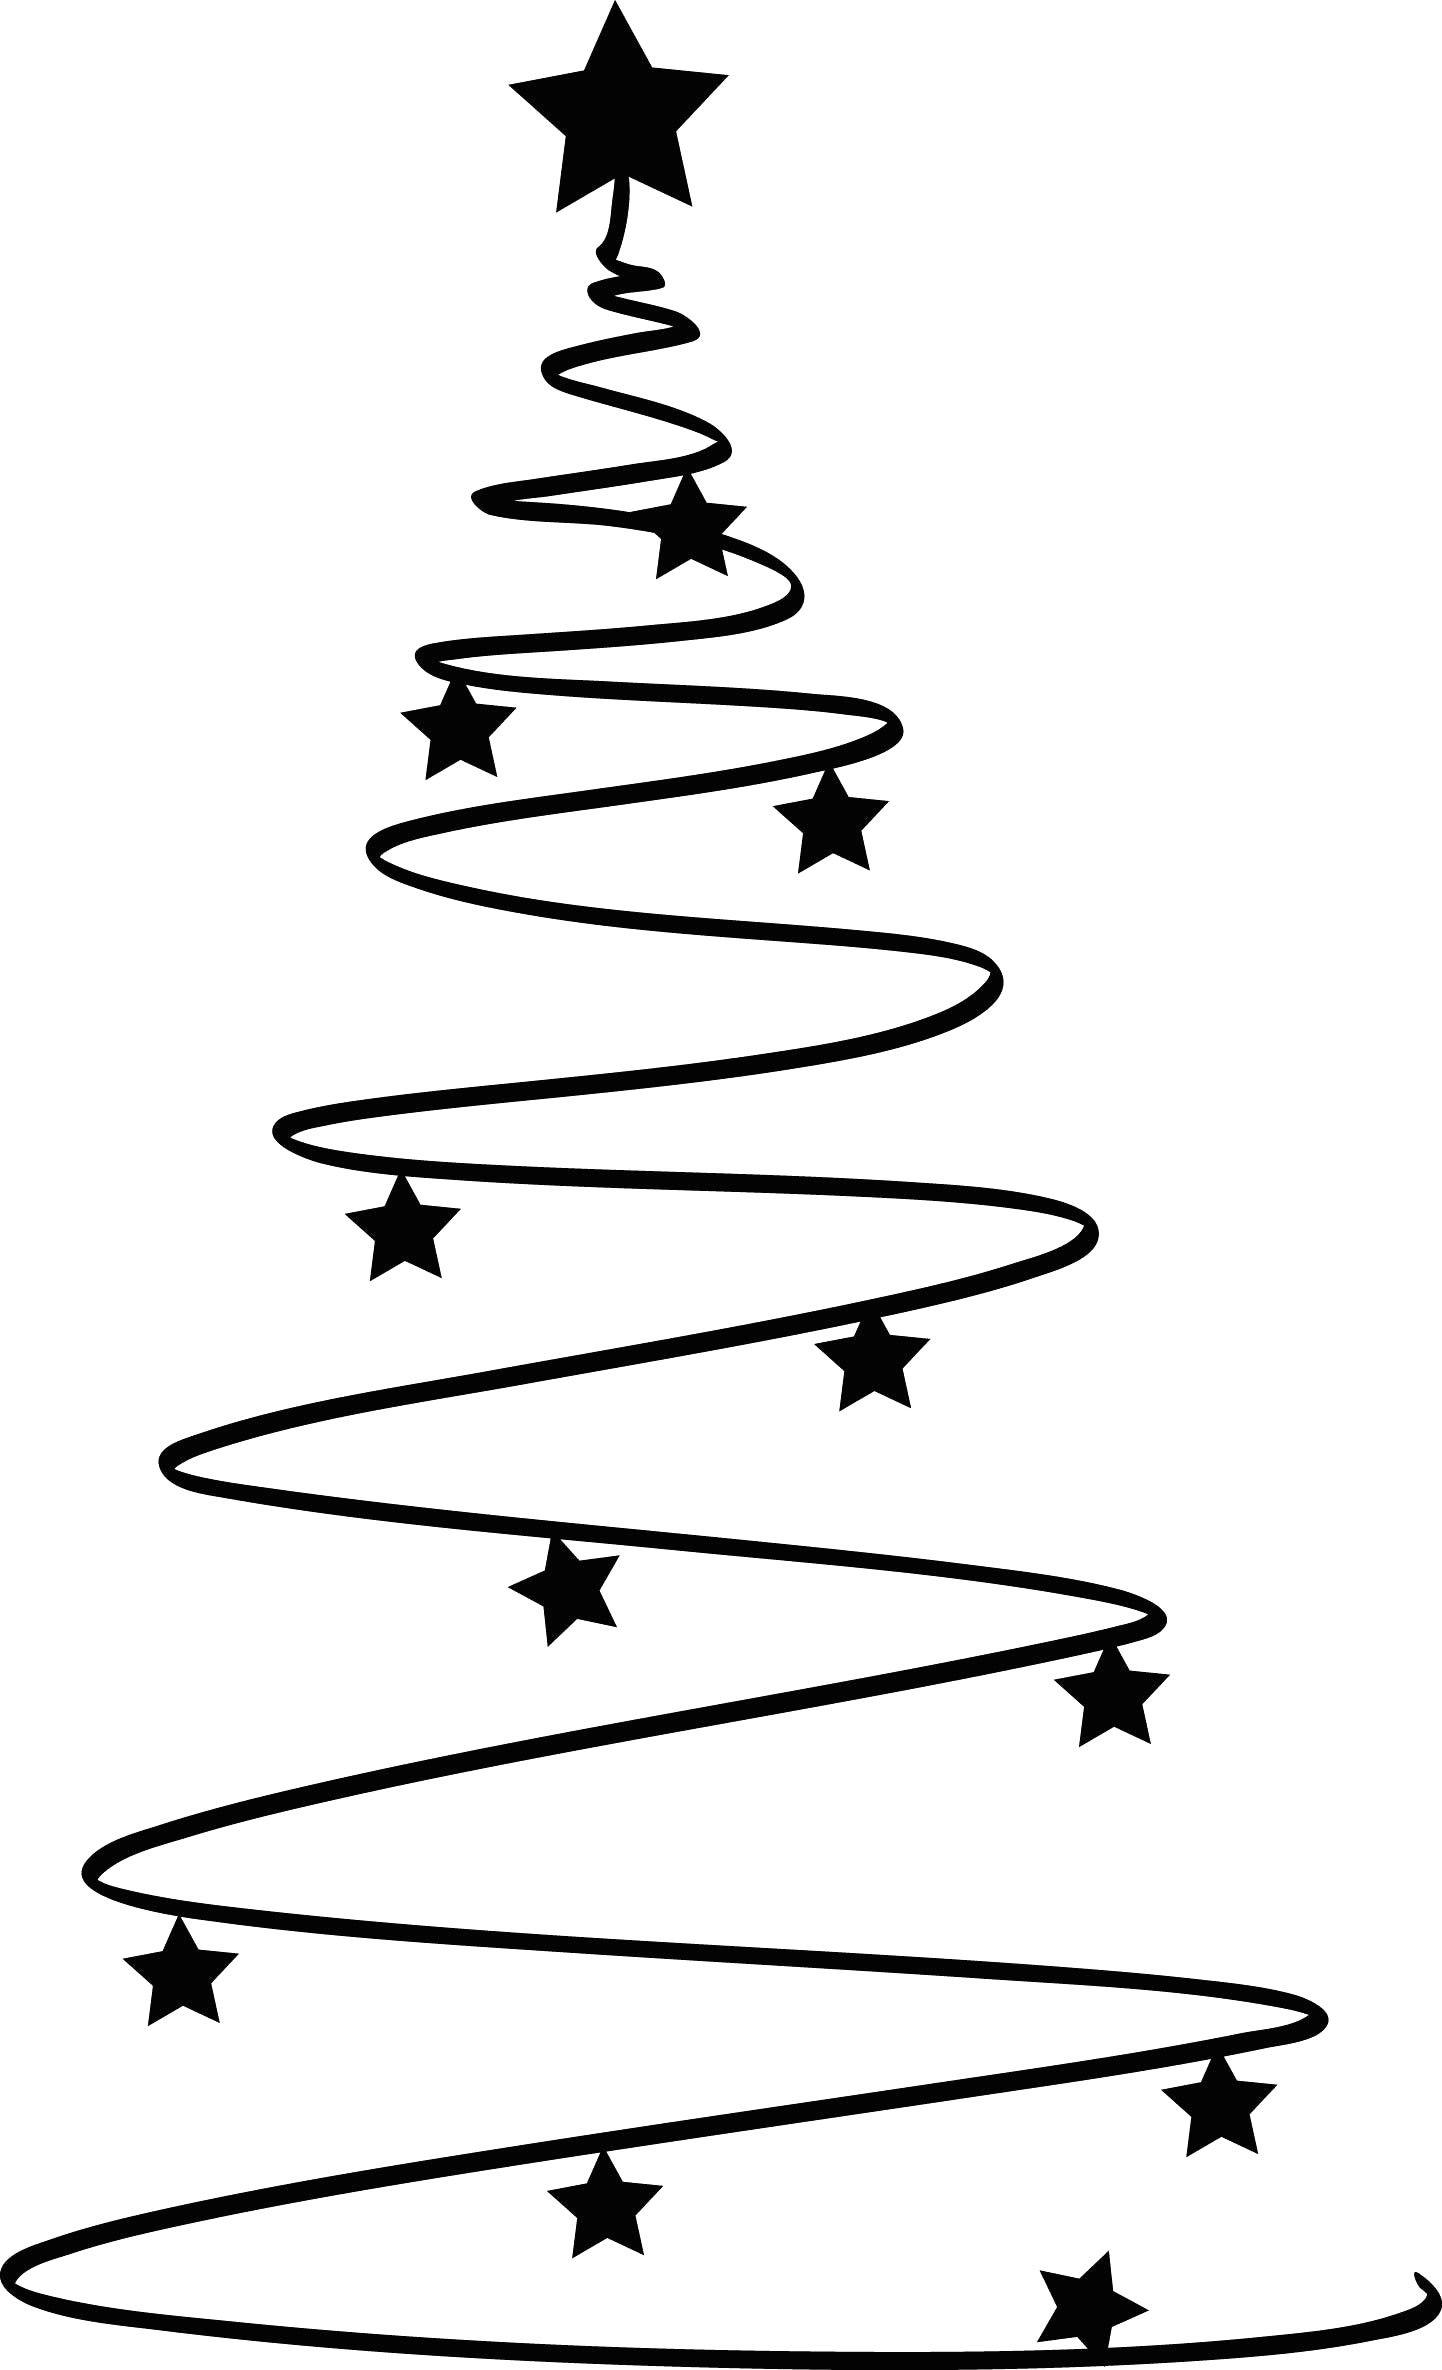 Sapin De Noel Design Dessin | Sapin de noel design, Sapin dessin